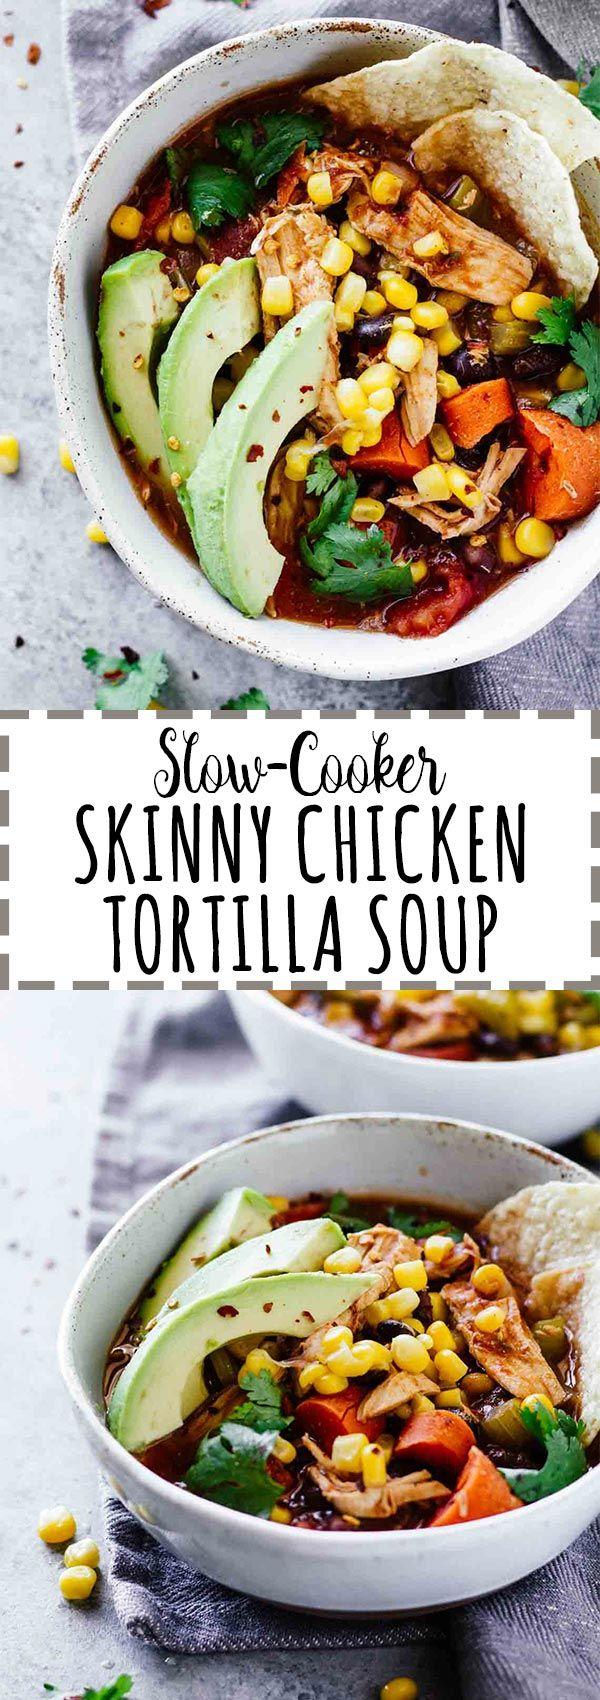 Slow Cooker Skinny Chicken Tortilla Soup - Jar Of Lemons